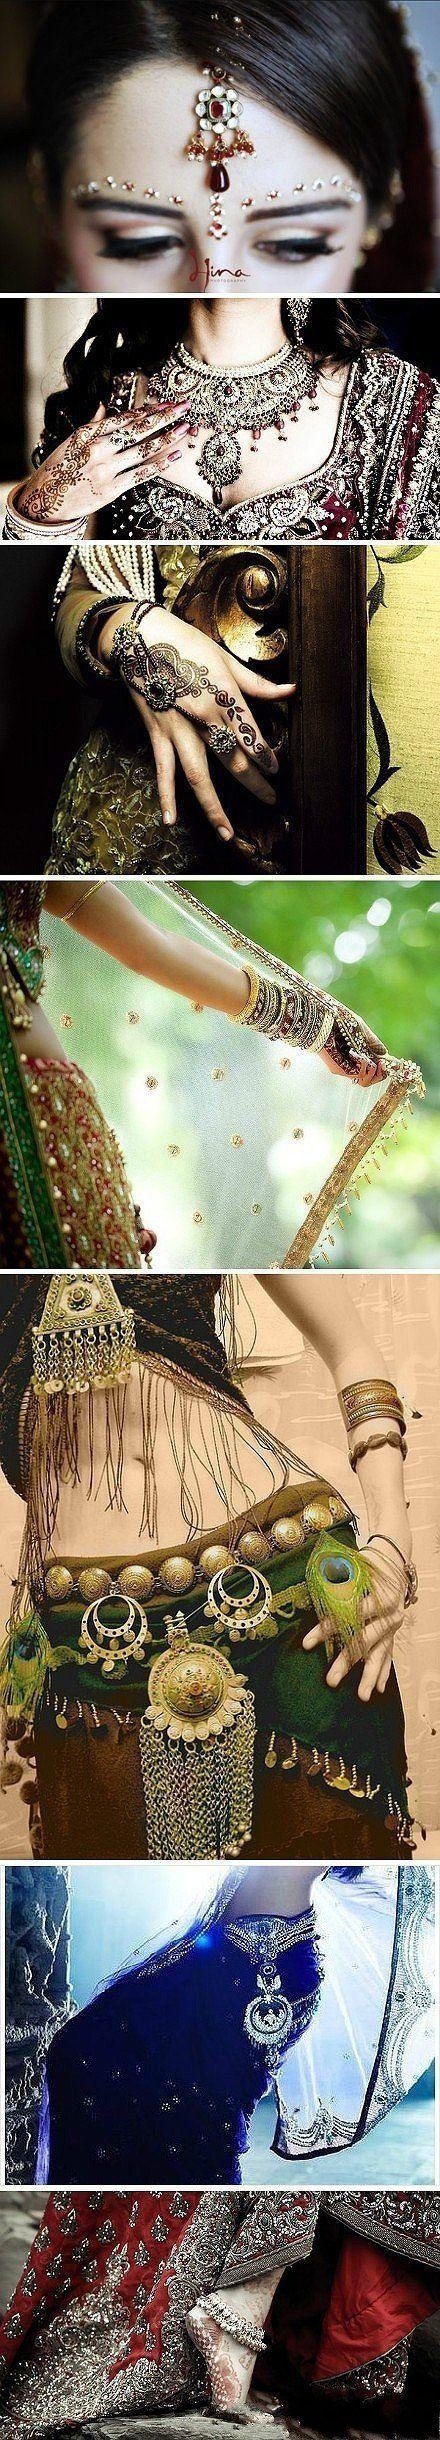 "Indian Bride: Details ""(More surprise, just join us on http://zzkko.com/?surprise)"""